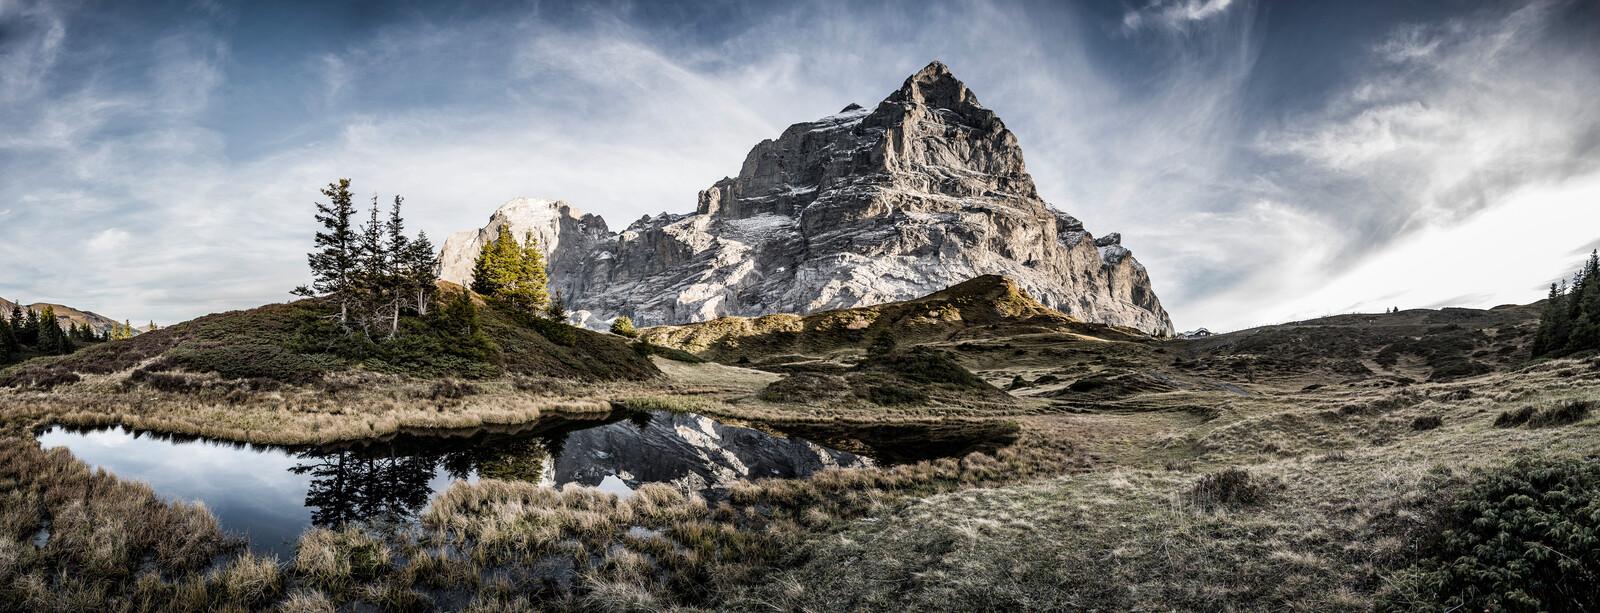 Wetterhorn, Grosse Scheidegg, Schweiz / Thomas Senf - Mammut Collection